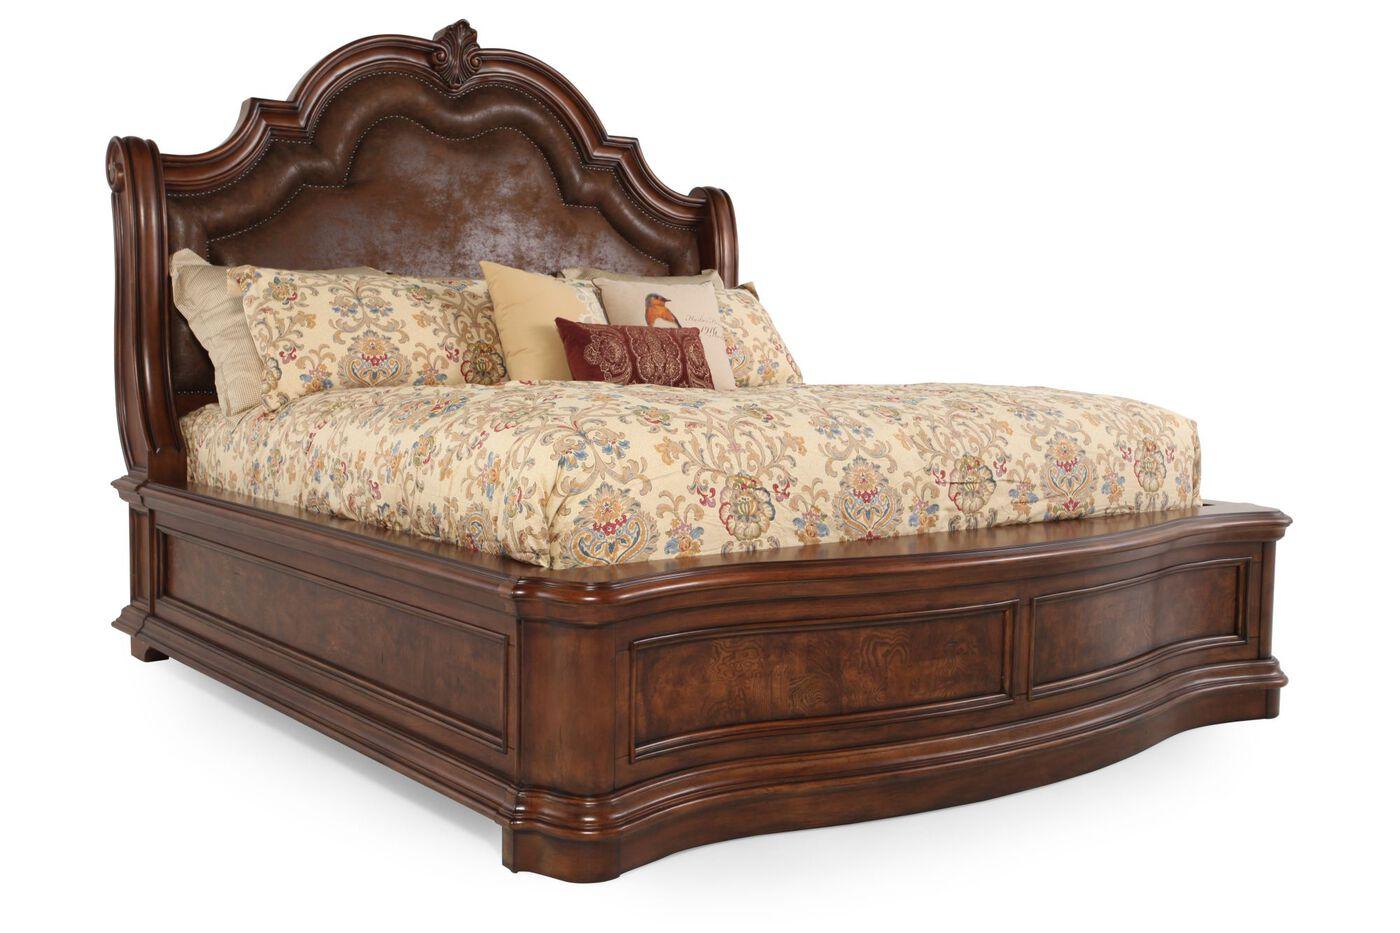 Pulaski San Mateo Sleigh Bed  Pulaski San Mateo Sleigh Bed   Mathis Brothers Furniture. San Mateo Bedroom Set Pulaski Furniture. Home Design Ideas